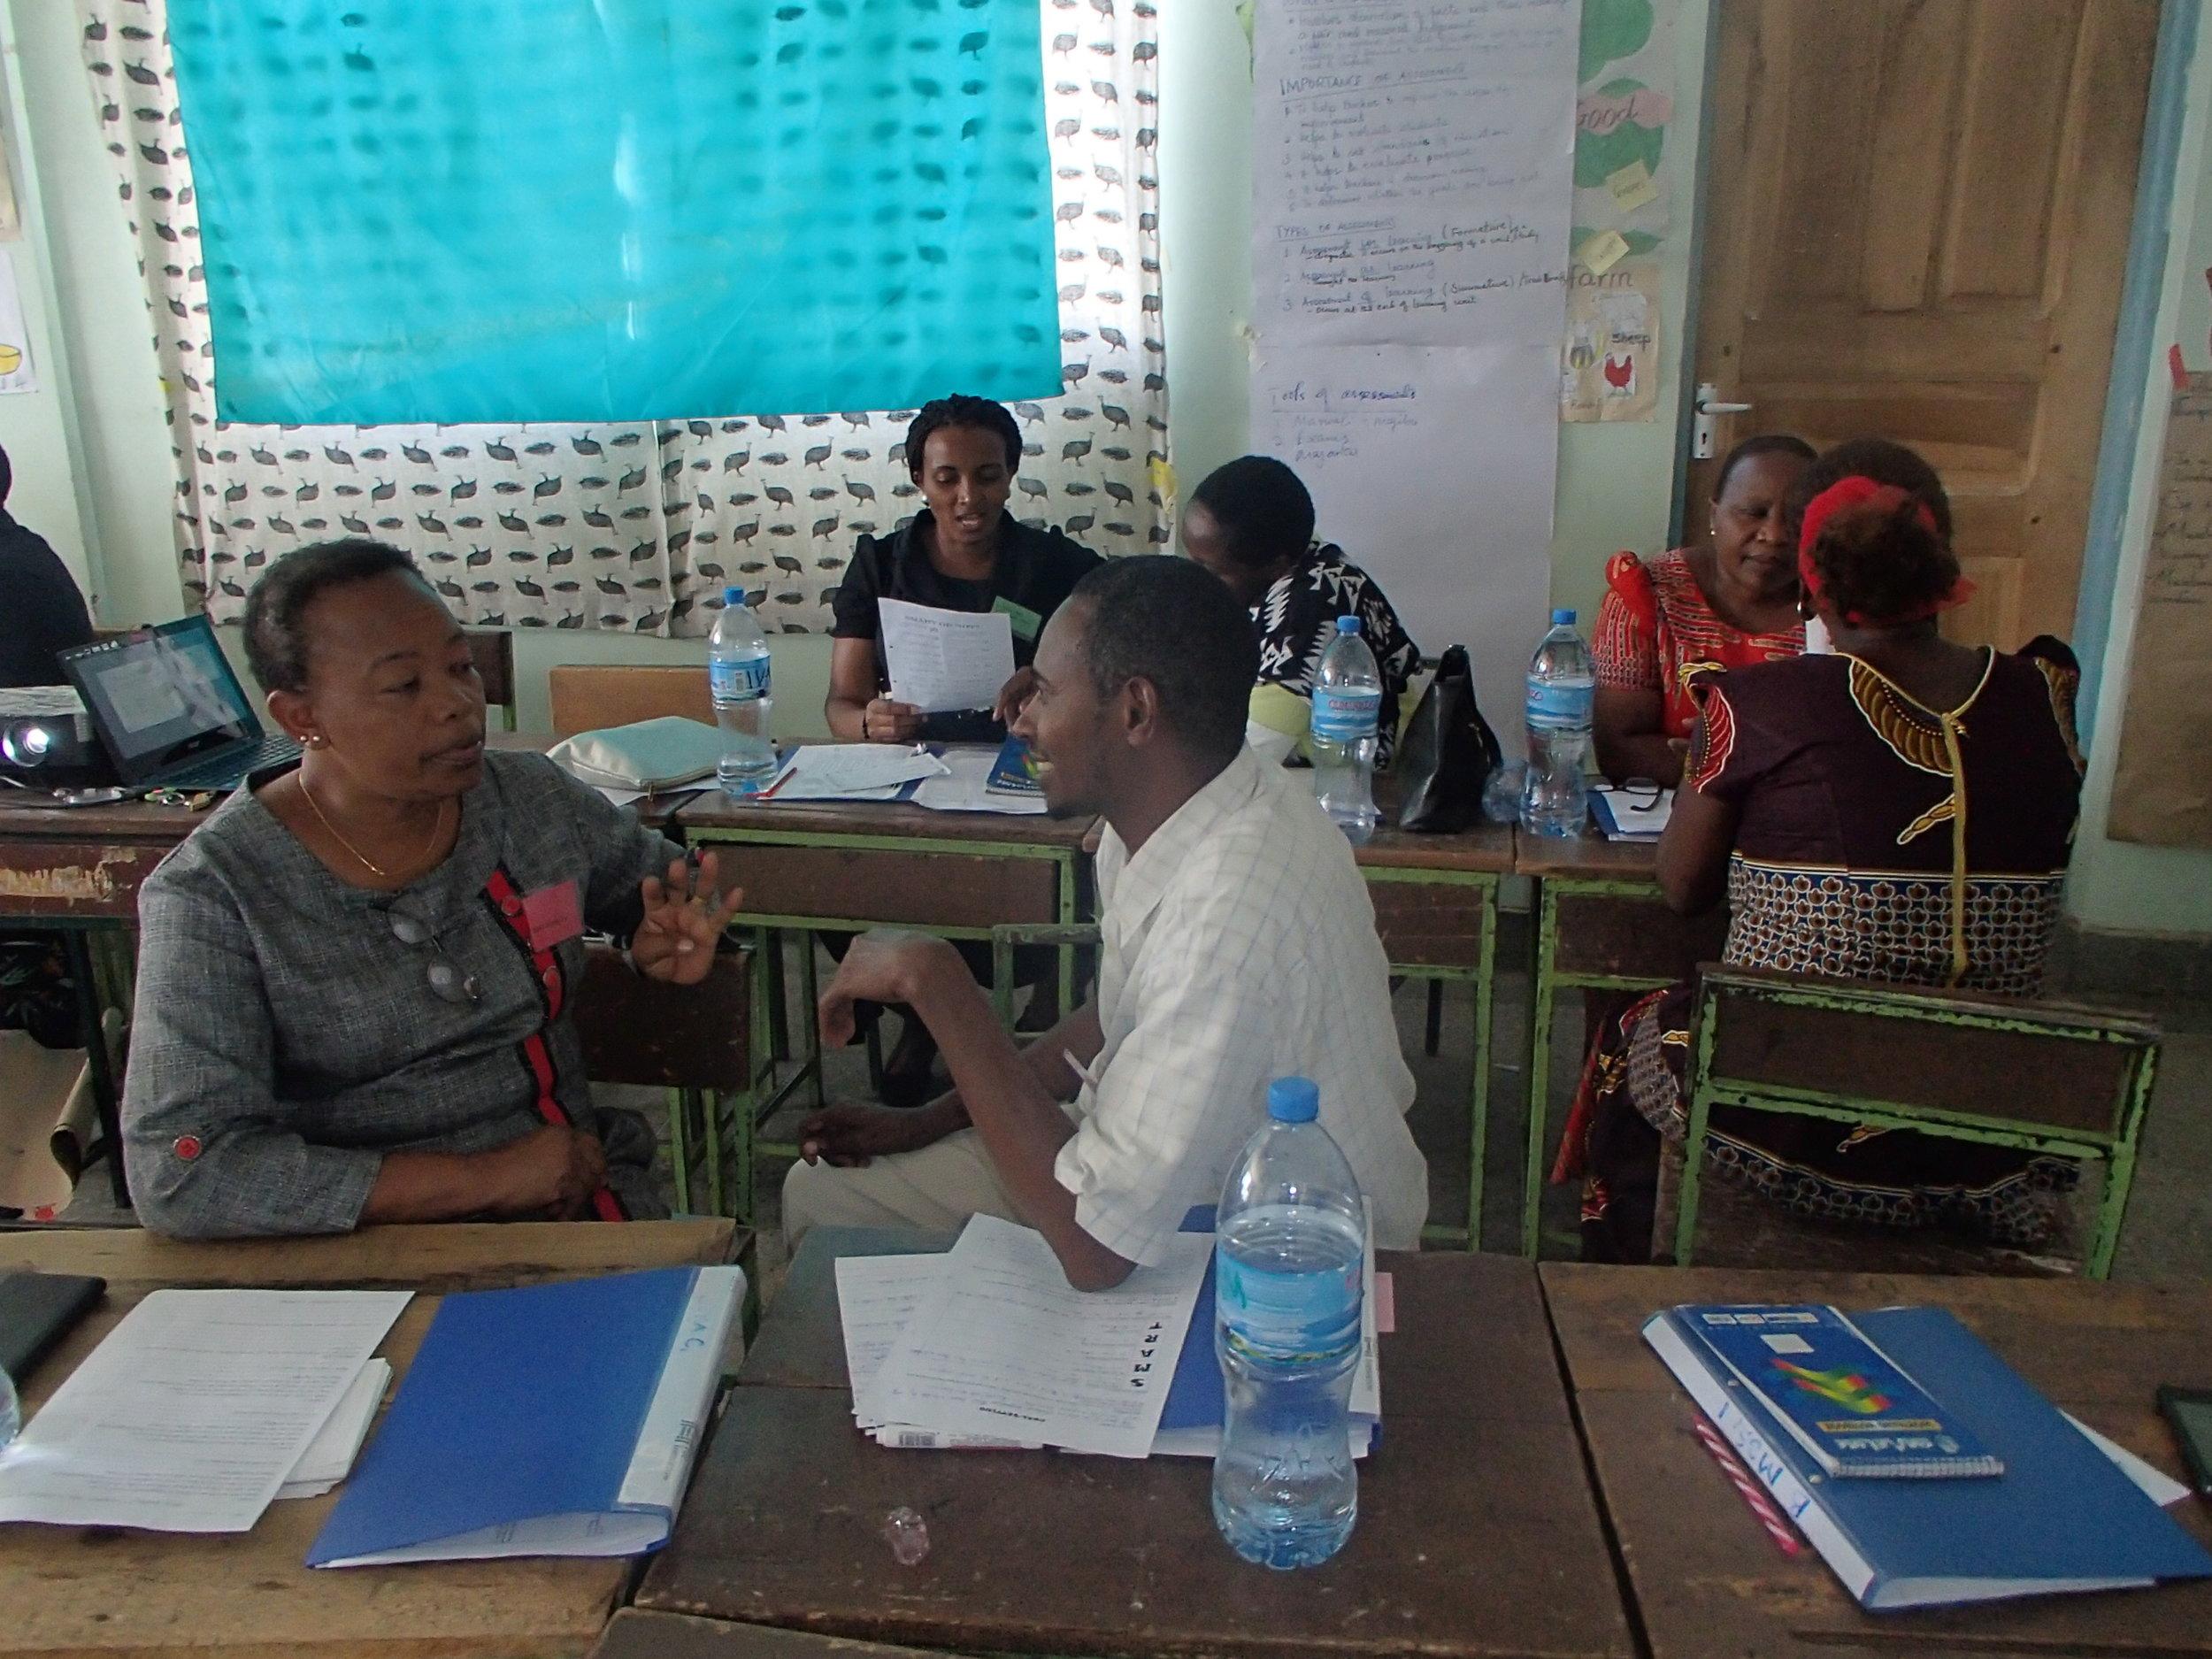 2019 Teacher Mentoring Training Workshop. Practicing mentoring conversations.